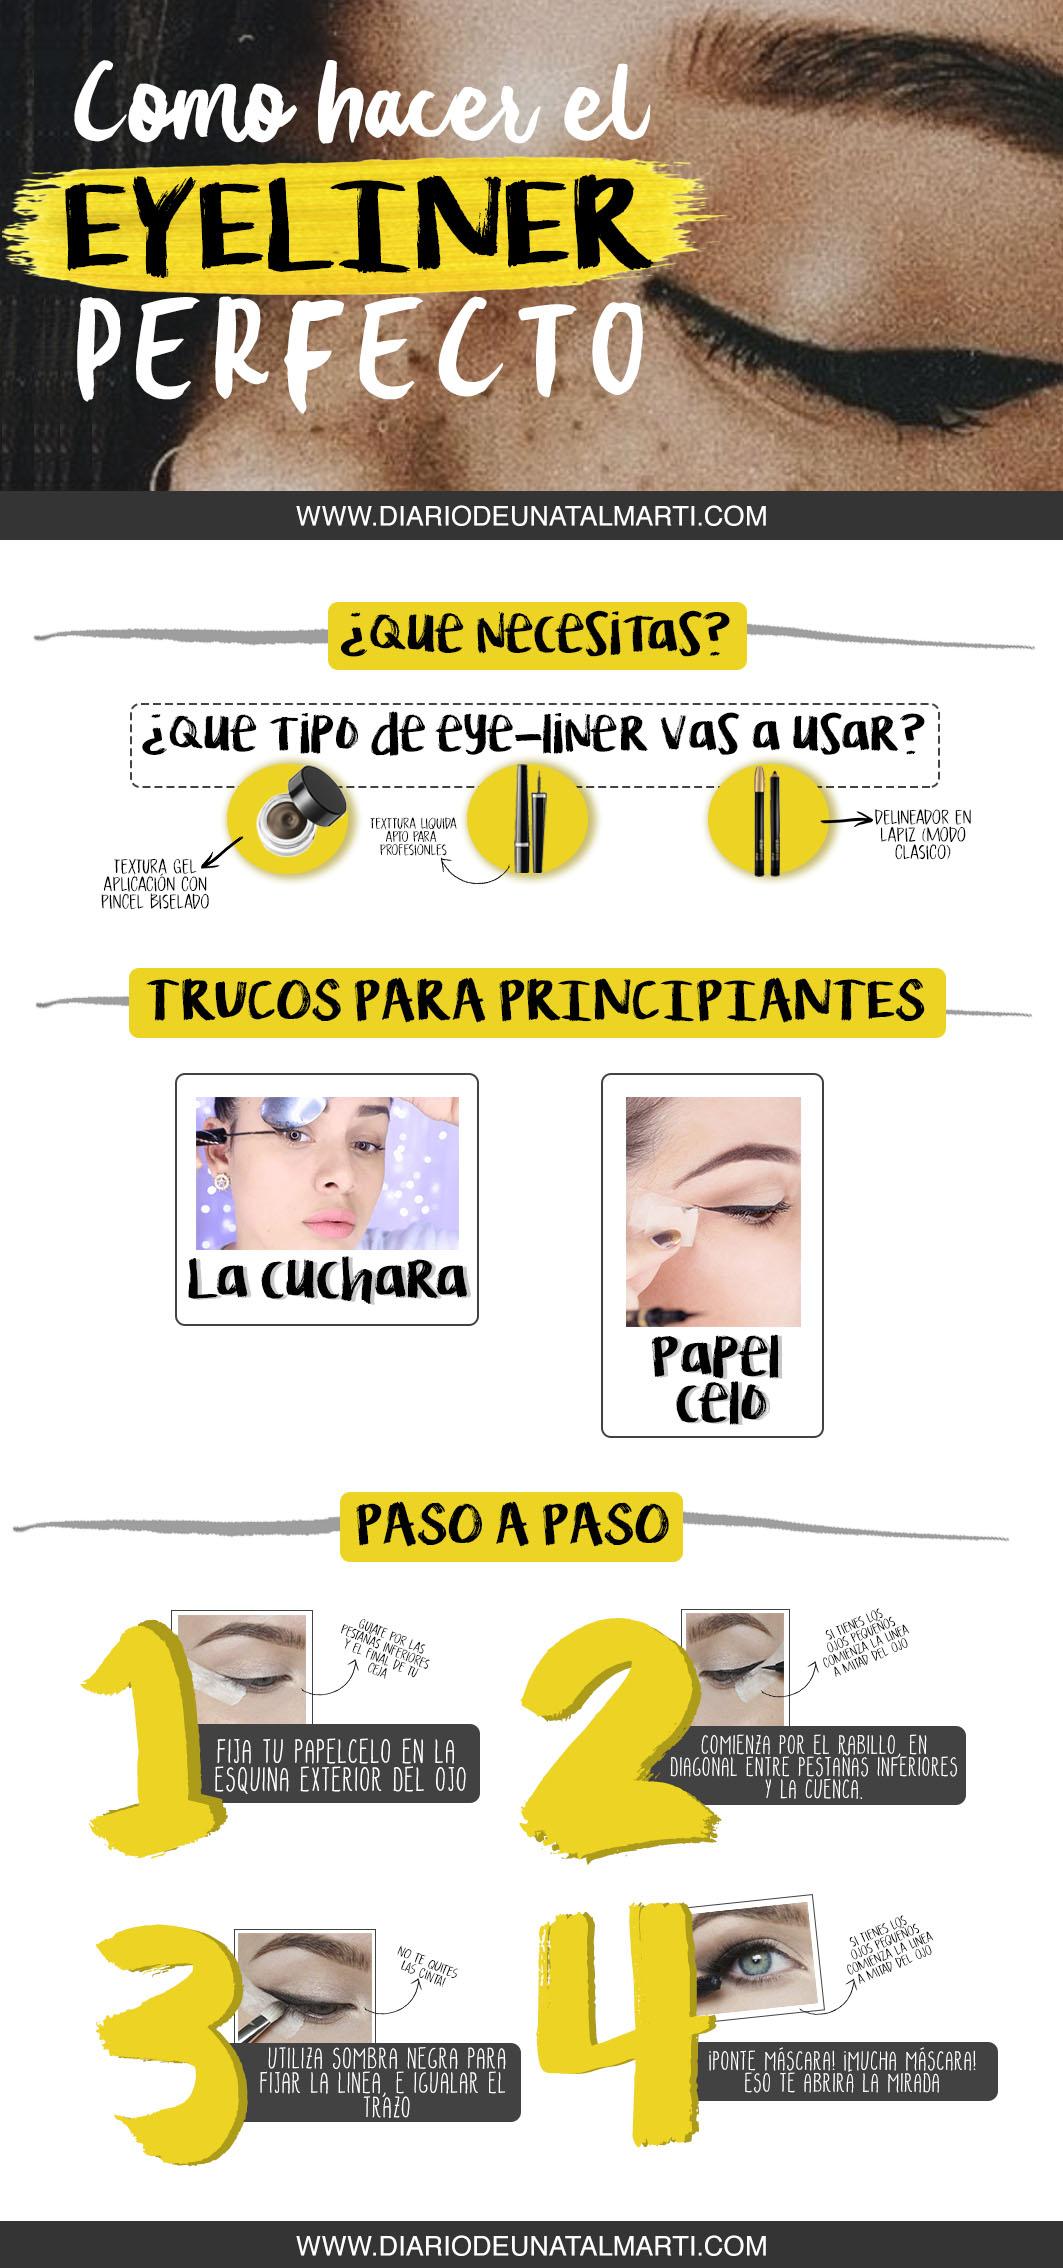 info-eyeliner-paso-paso